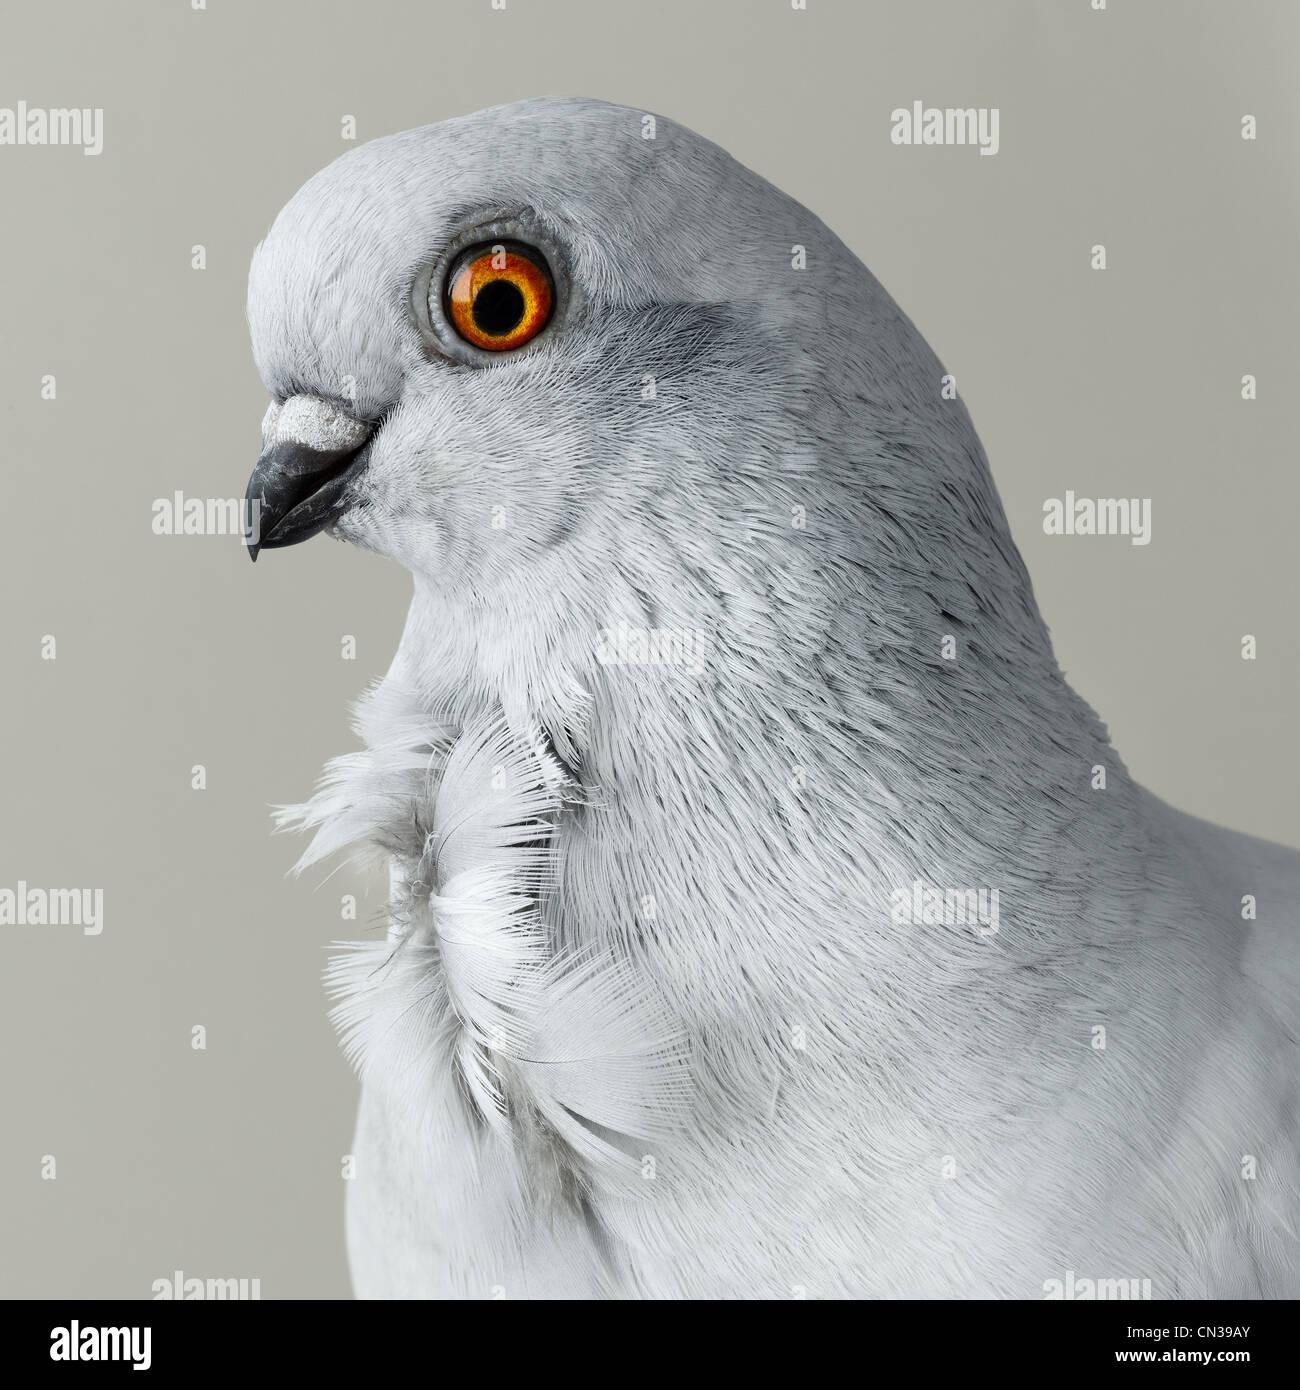 Grey pigeon - Stock Image